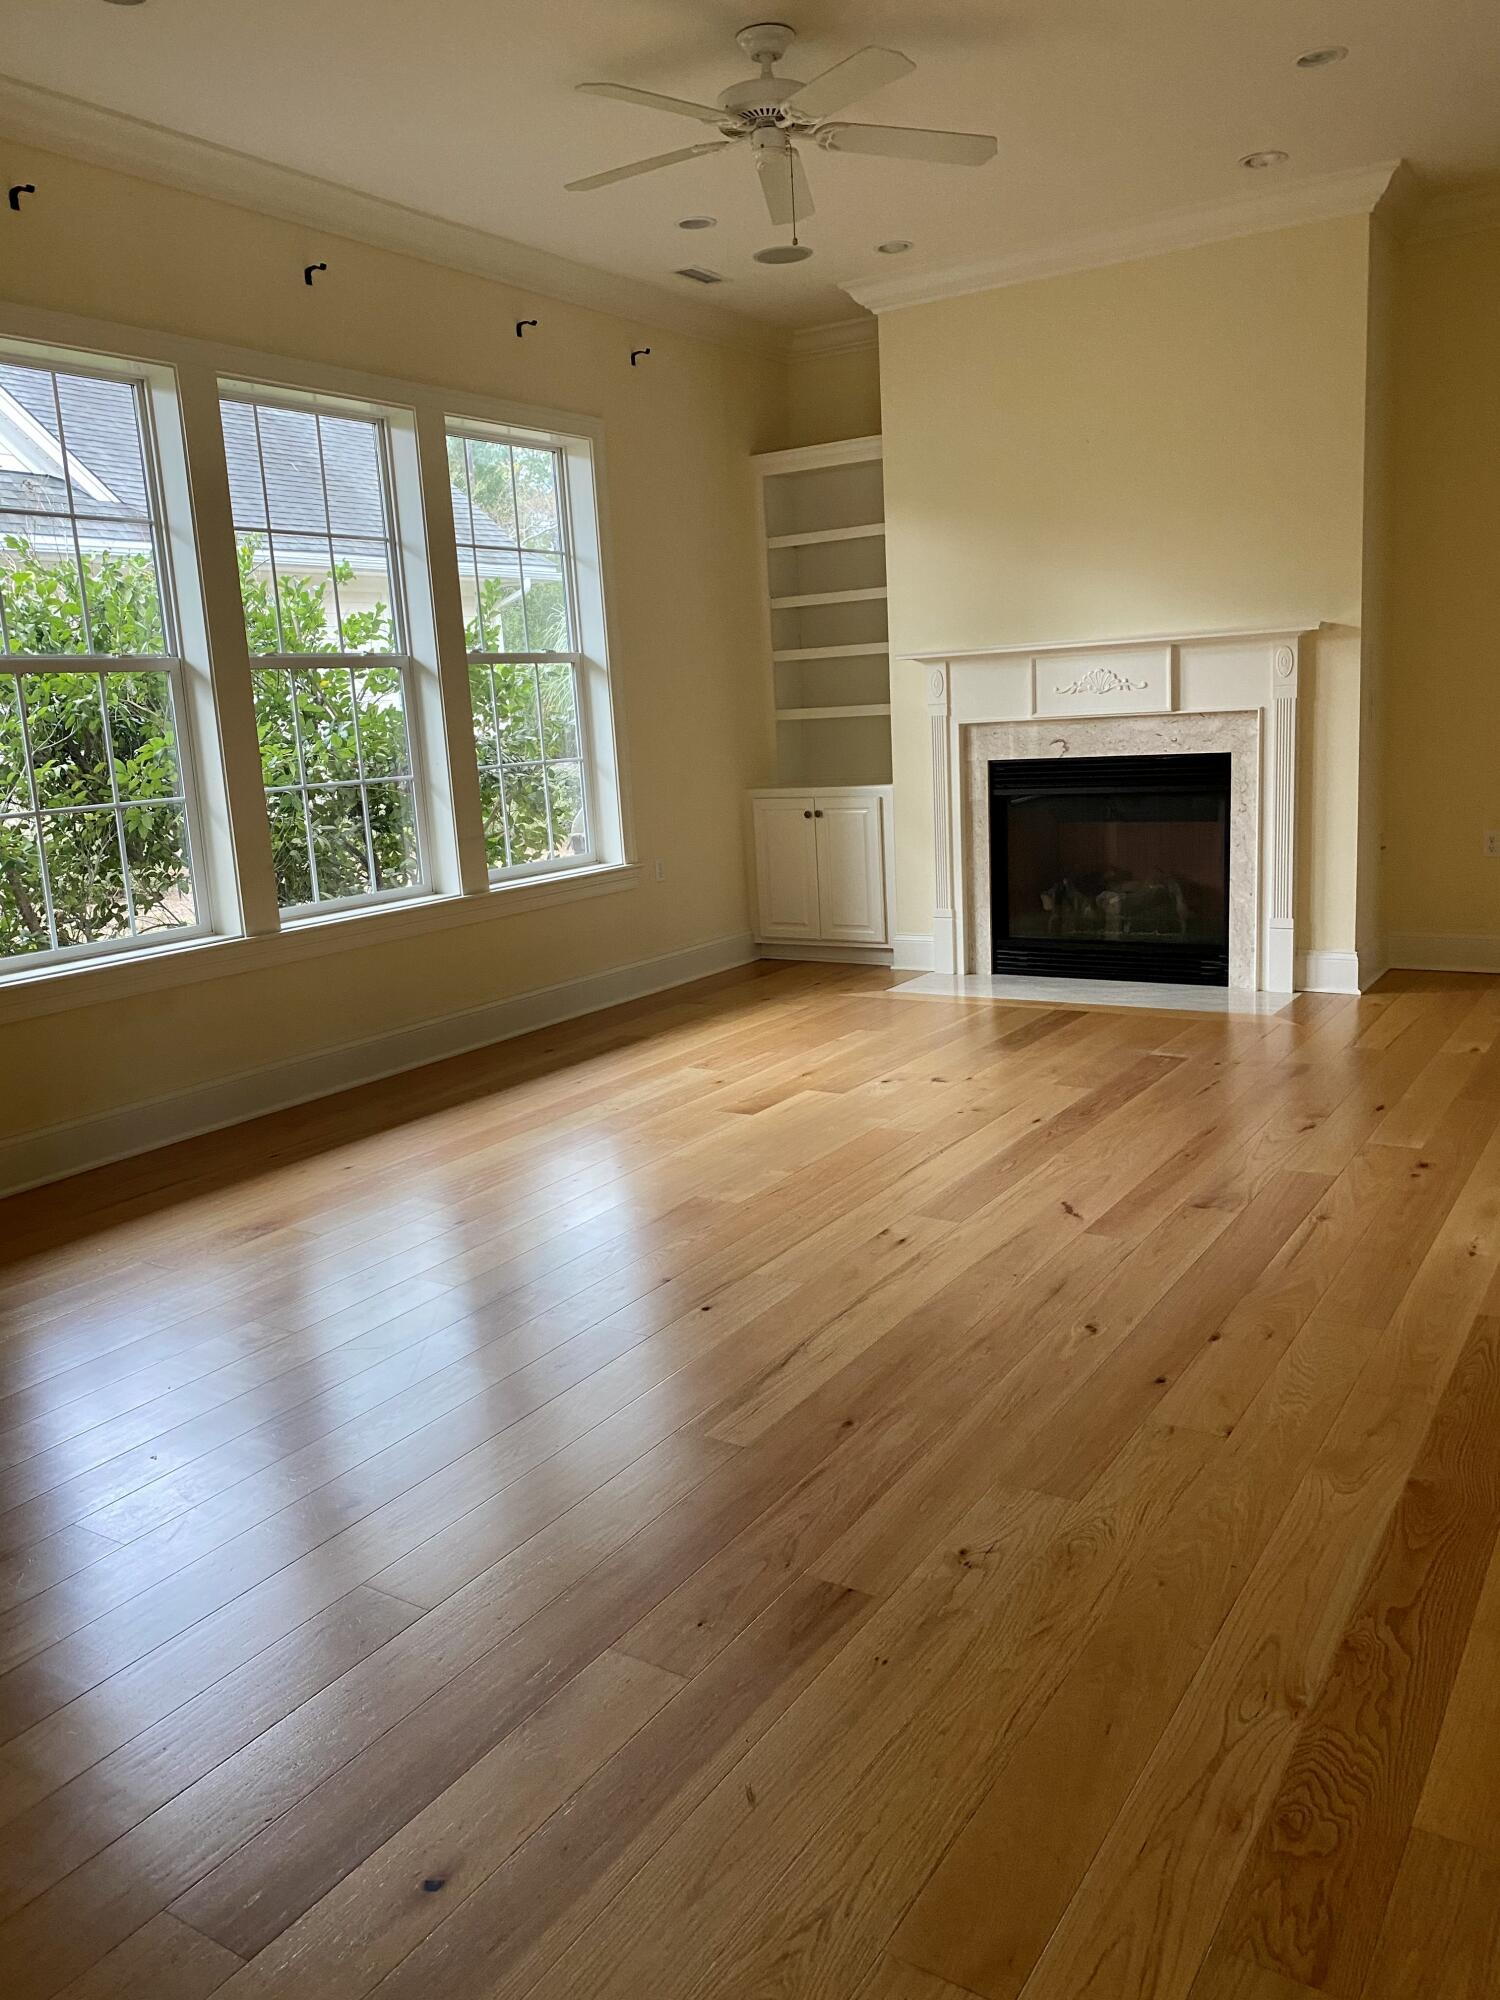 Park West Homes For Sale - 3090 Rice Field, Mount Pleasant, SC - 1